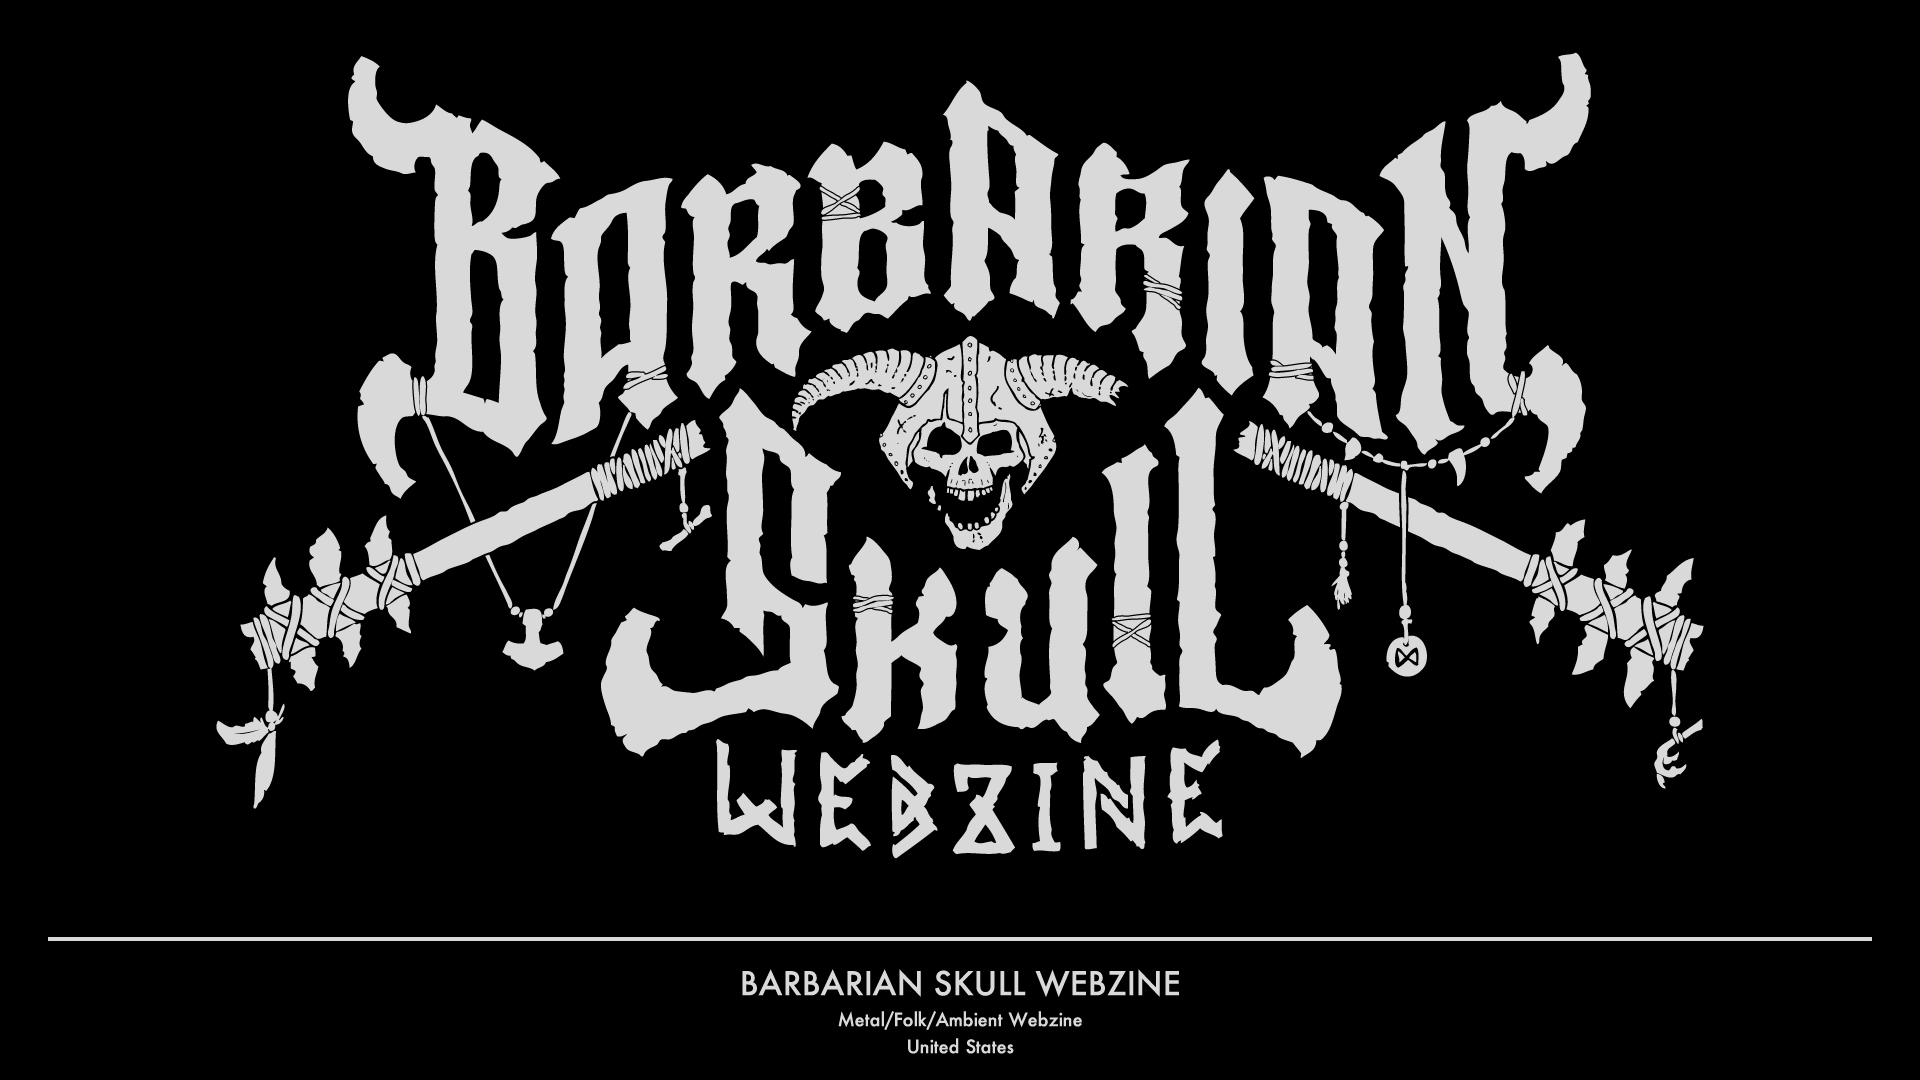 Barbarian_Skull_Webzine.jpg